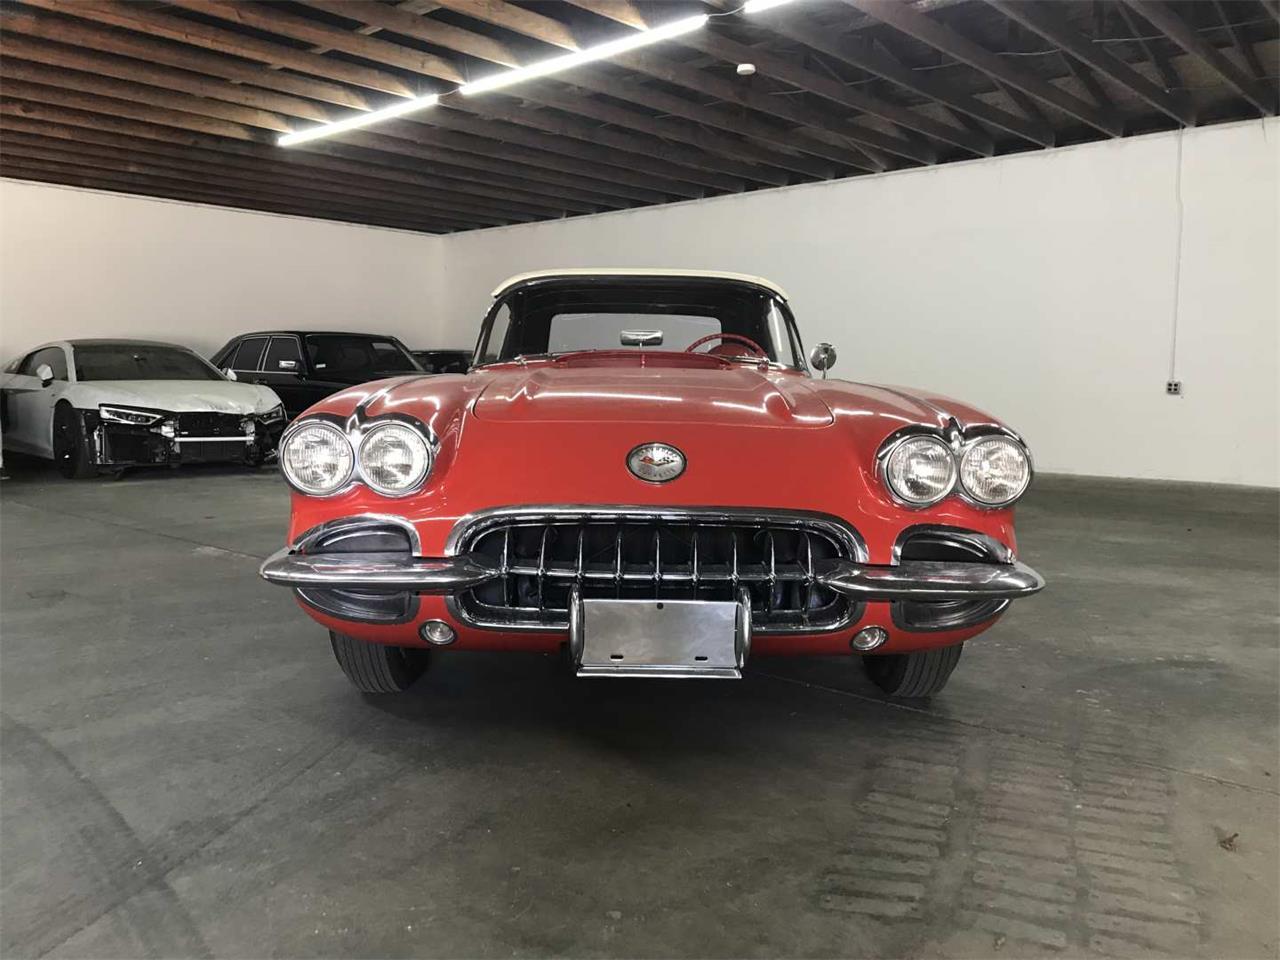 1959 Chevrolet Corvette (CC-1263264) for sale in Biloxi, Mississippi